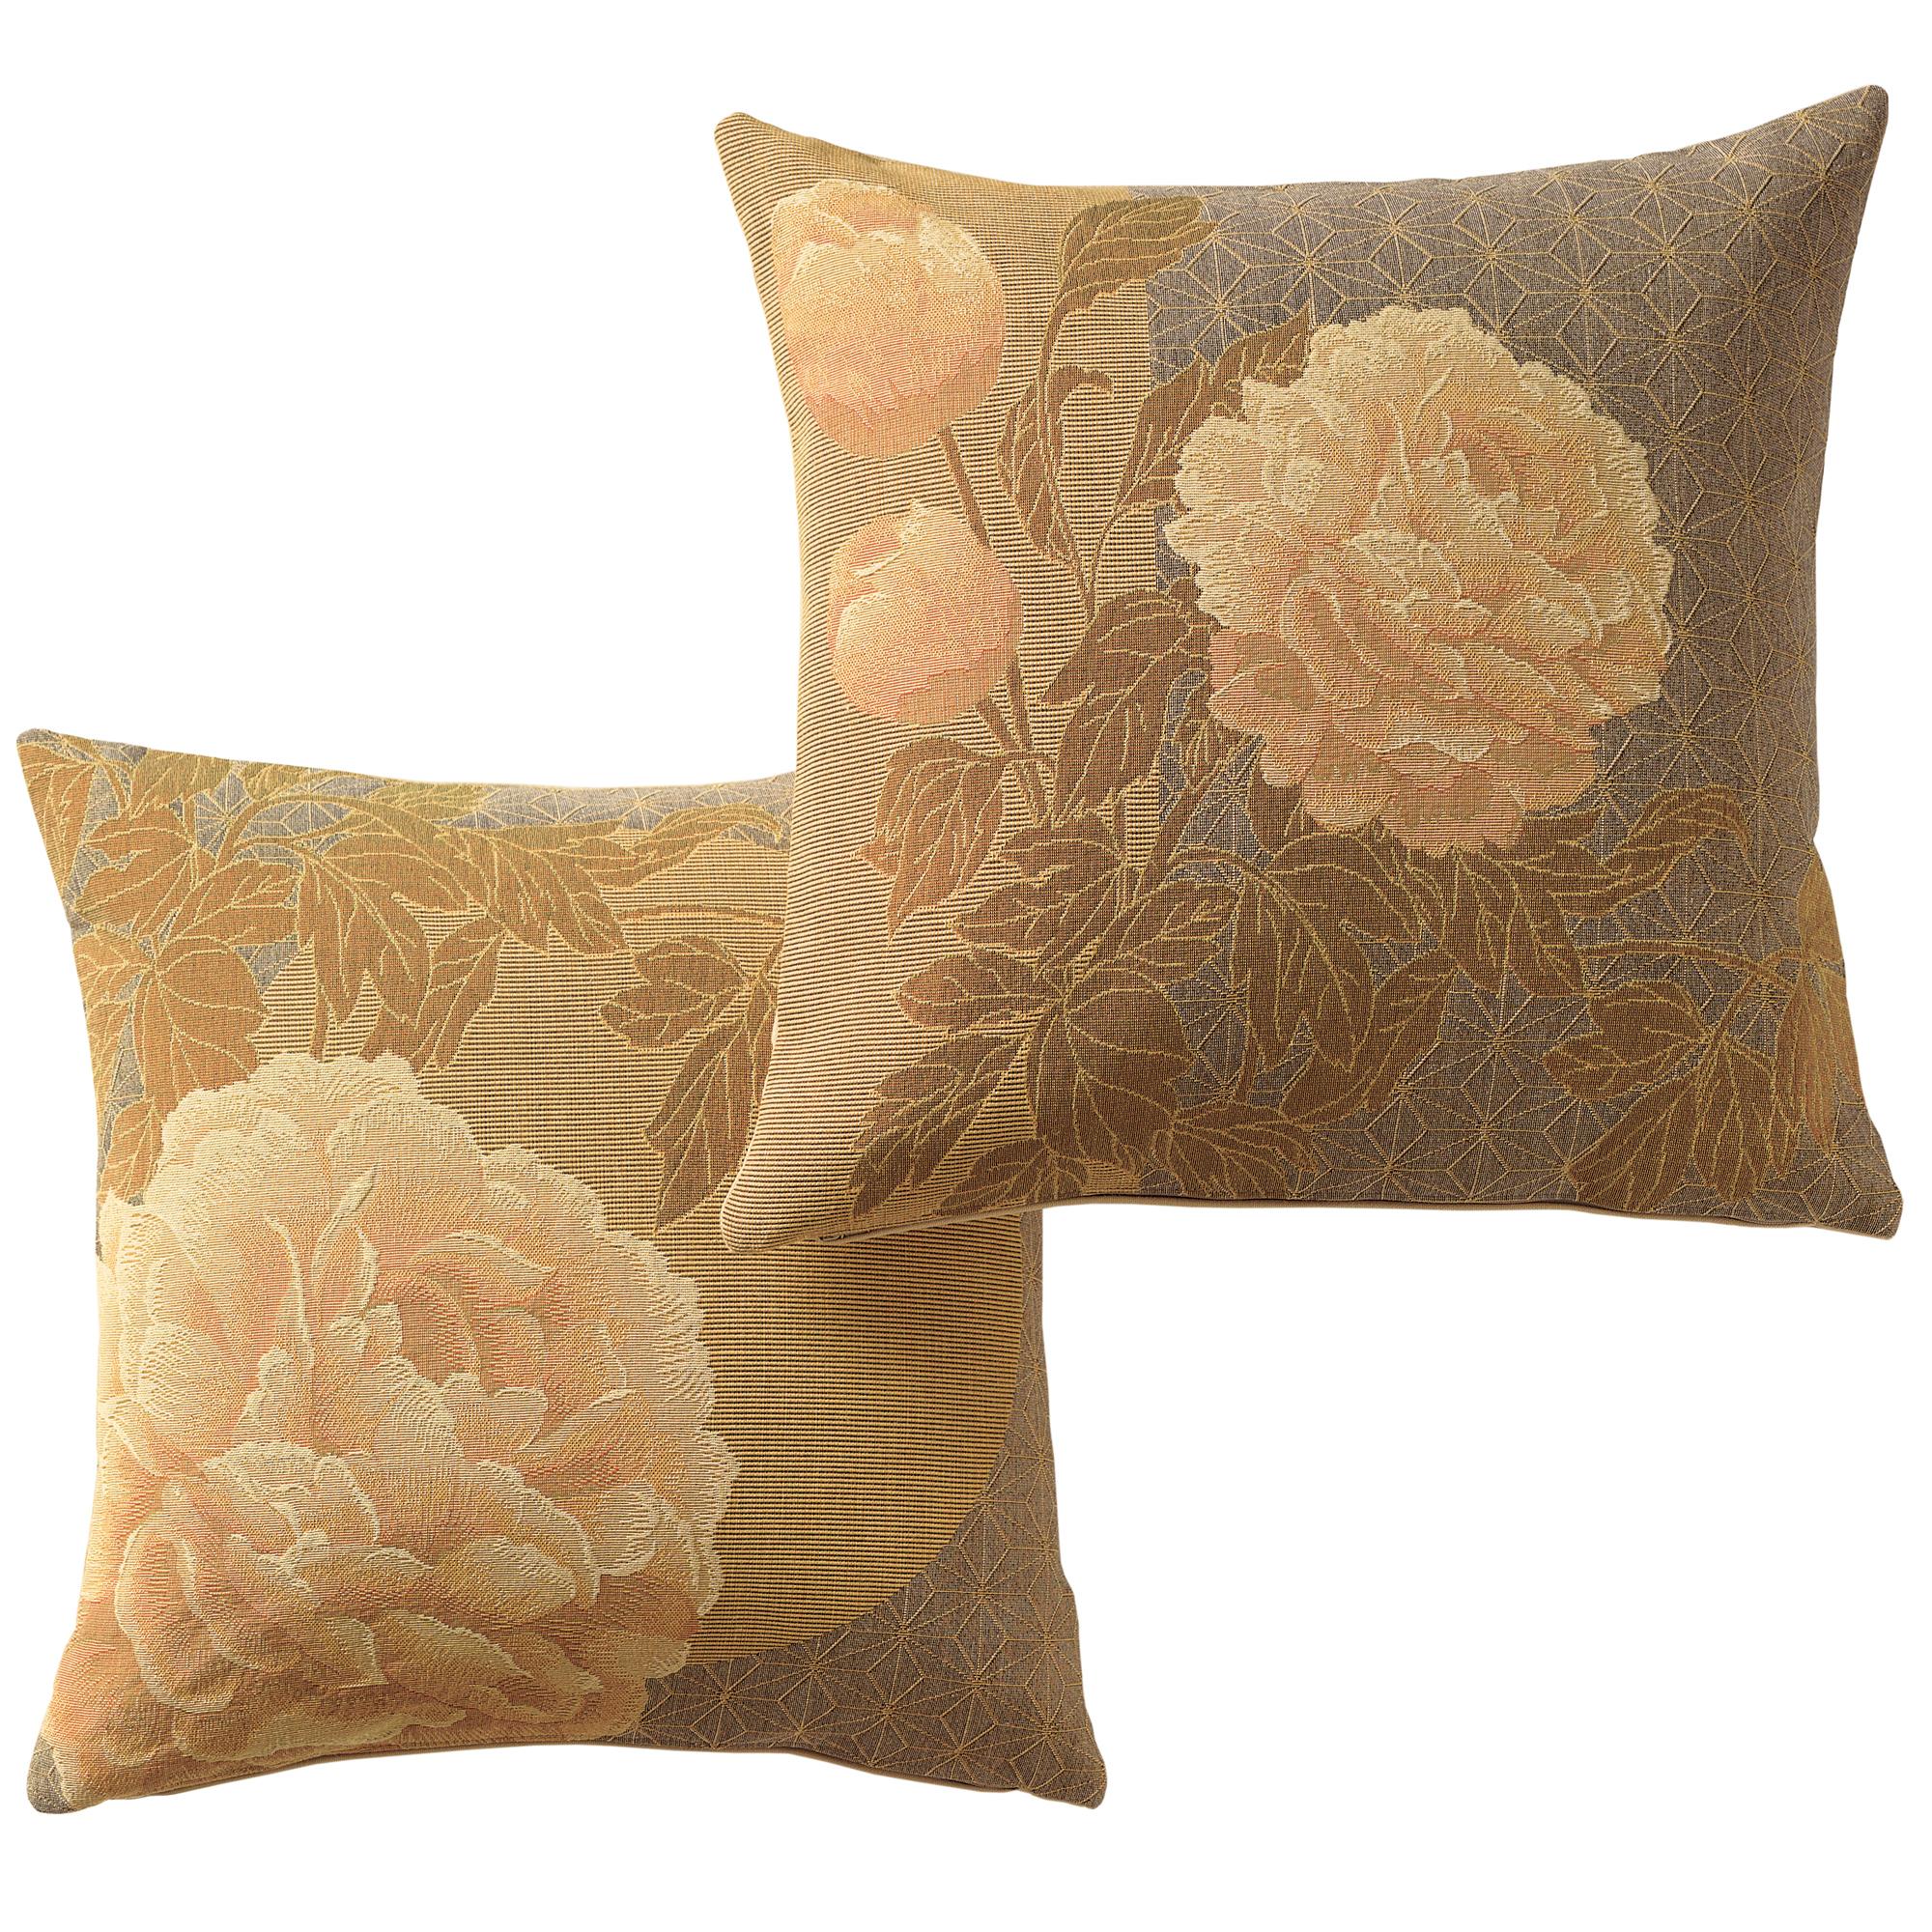 Throw Pillows Home : Golden Peony Pillows Gump s